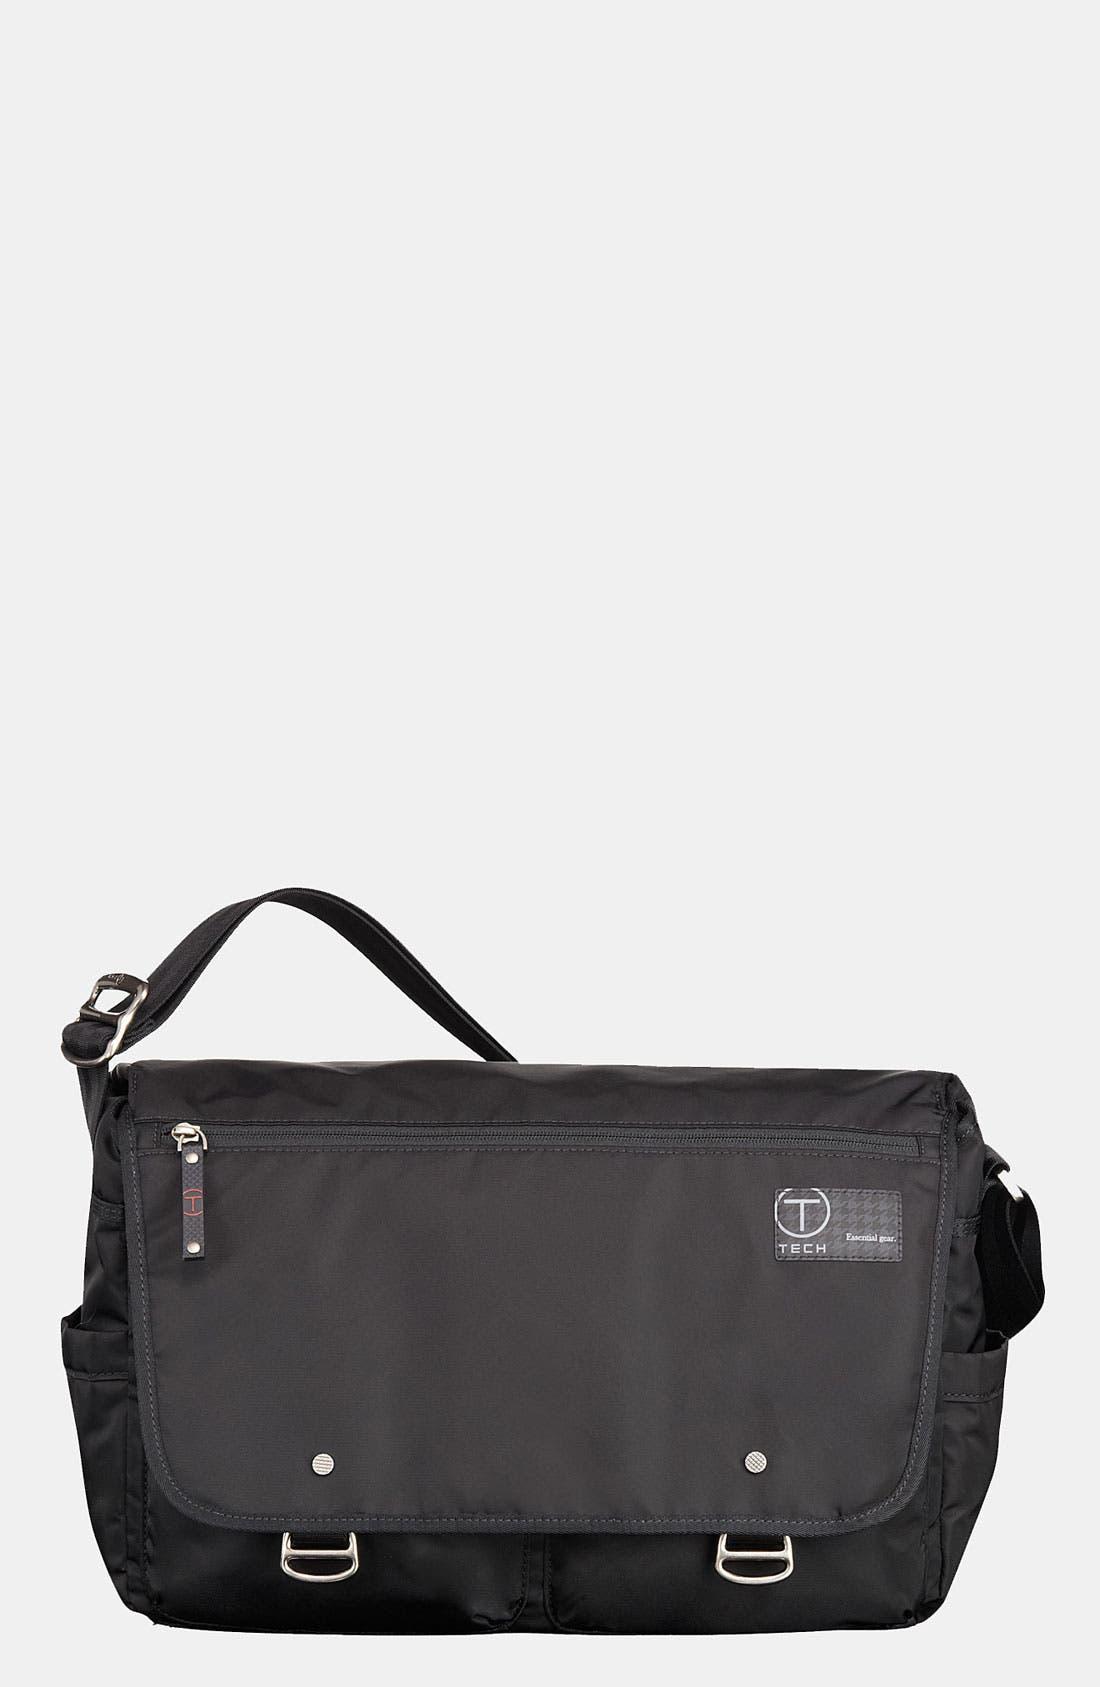 Main Image - Tumi 'T-Tech Icon - Hans' Laptop Messenger Bag